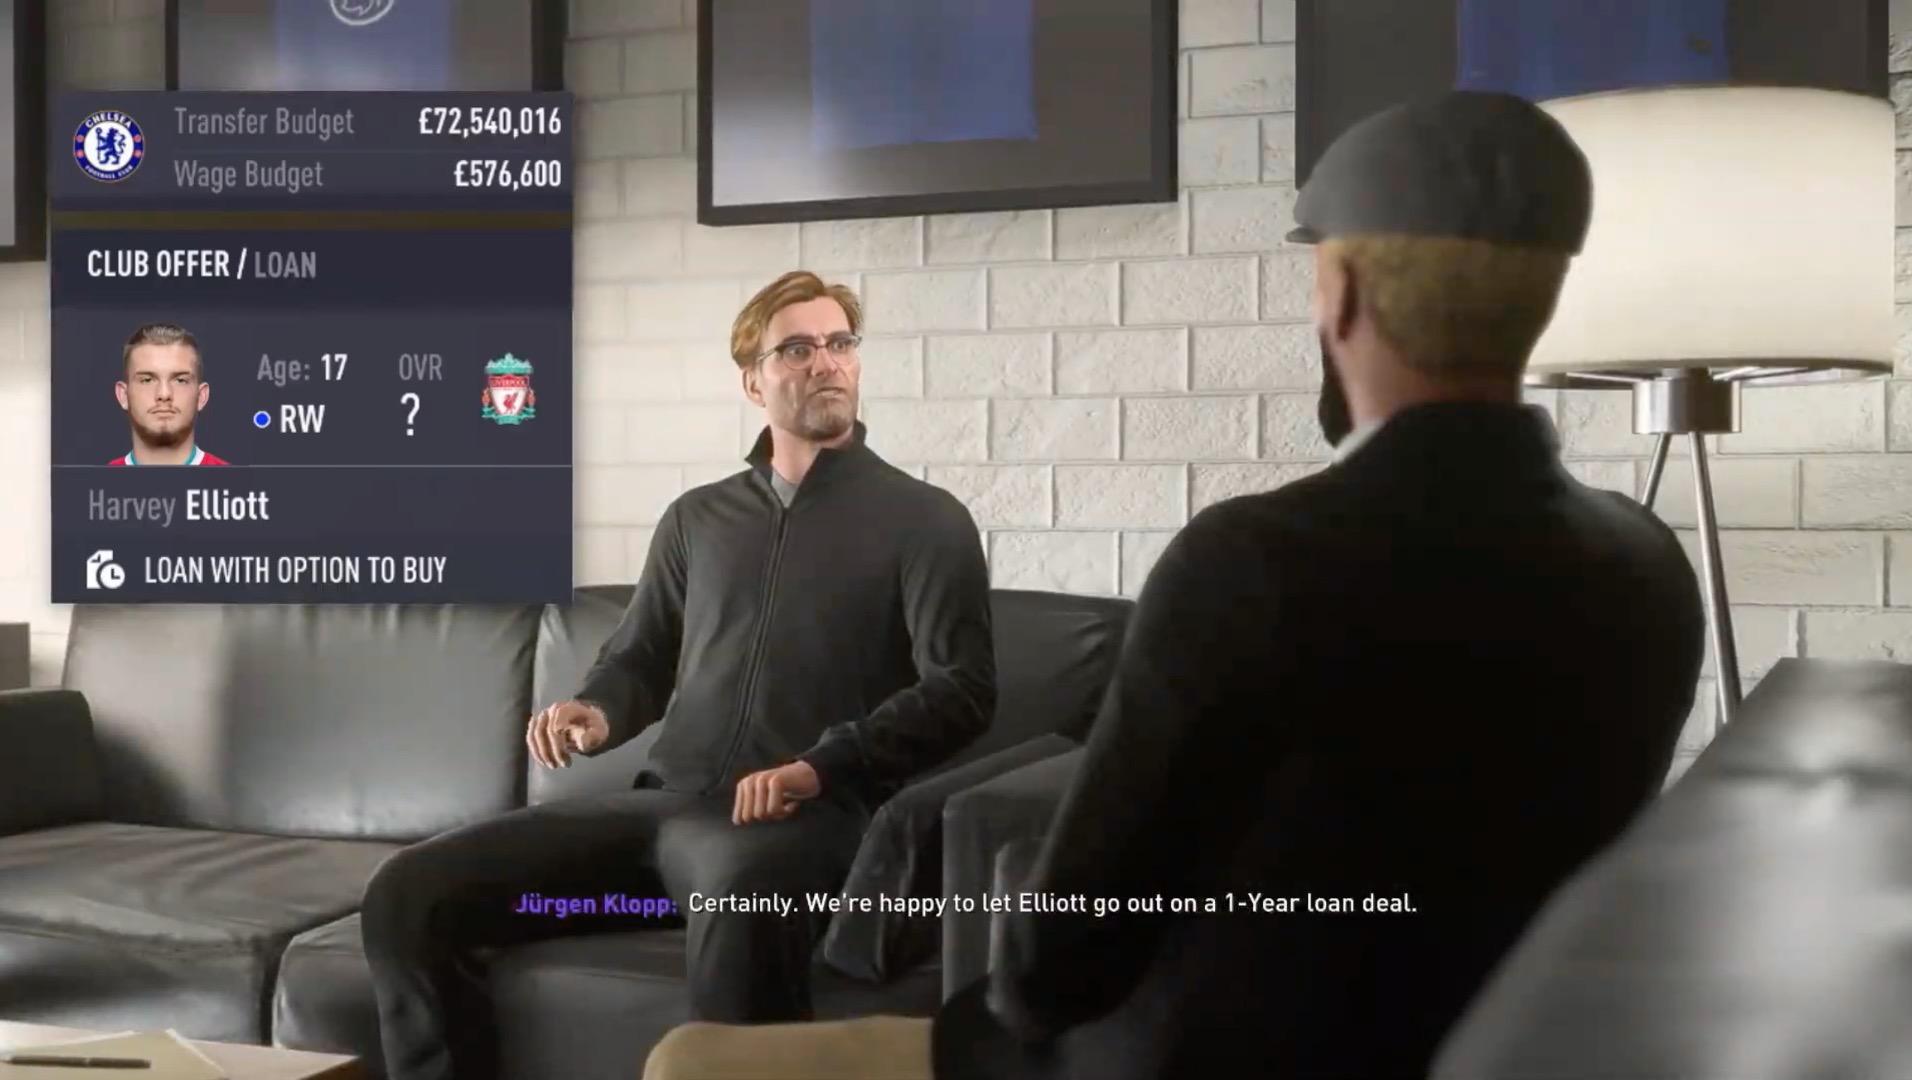 Klopp in FIFA 21